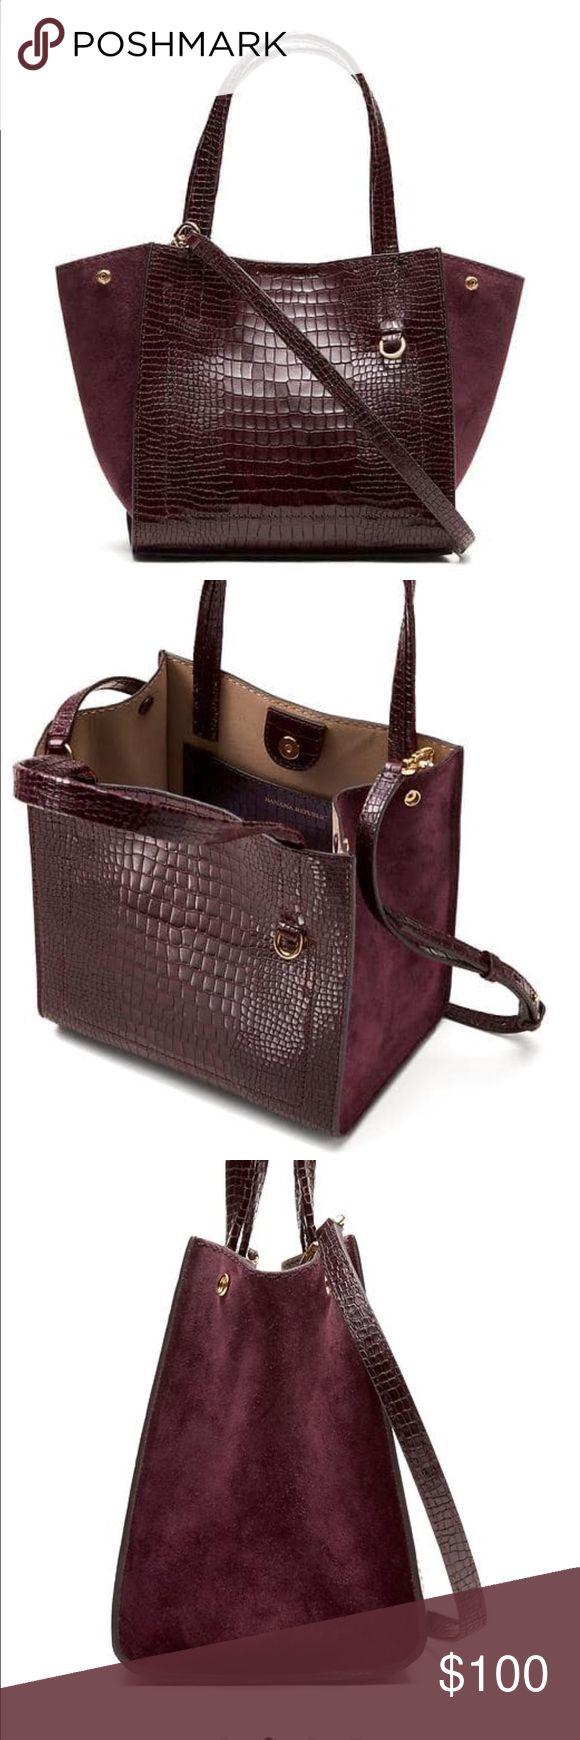 Banana Republic Handbag Brand New without tag Mini tote Burgundy color very stylish and elegant Banana Republic Bags Crossbody Bags